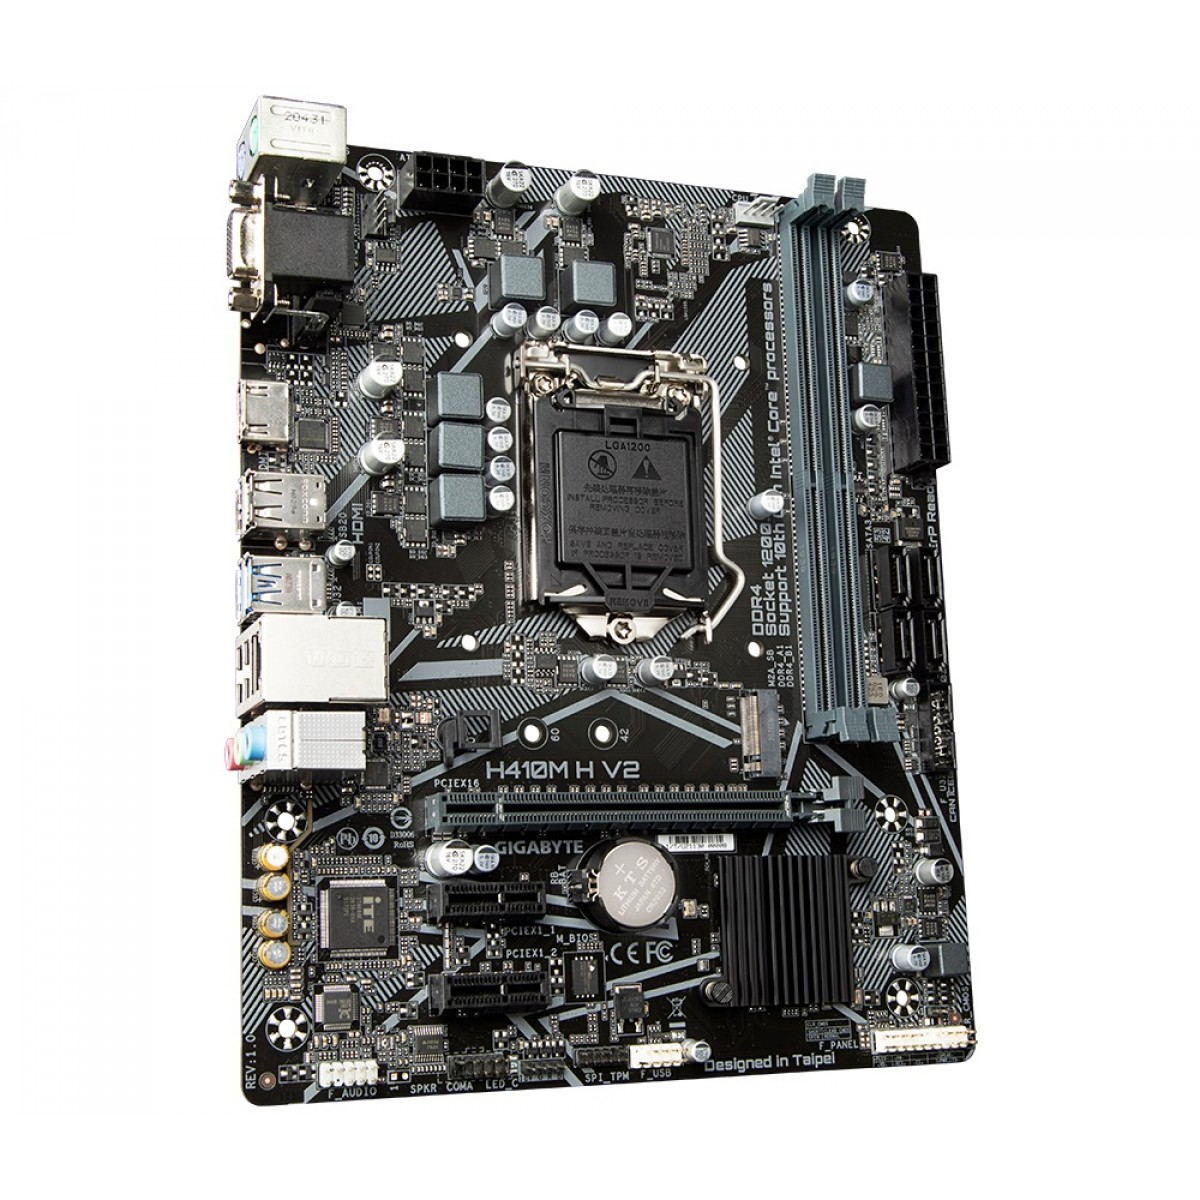 Placa Mãe Gigabyte H410M H V2, Chipset H470, Intel LGA 1200, mATX, DDR4